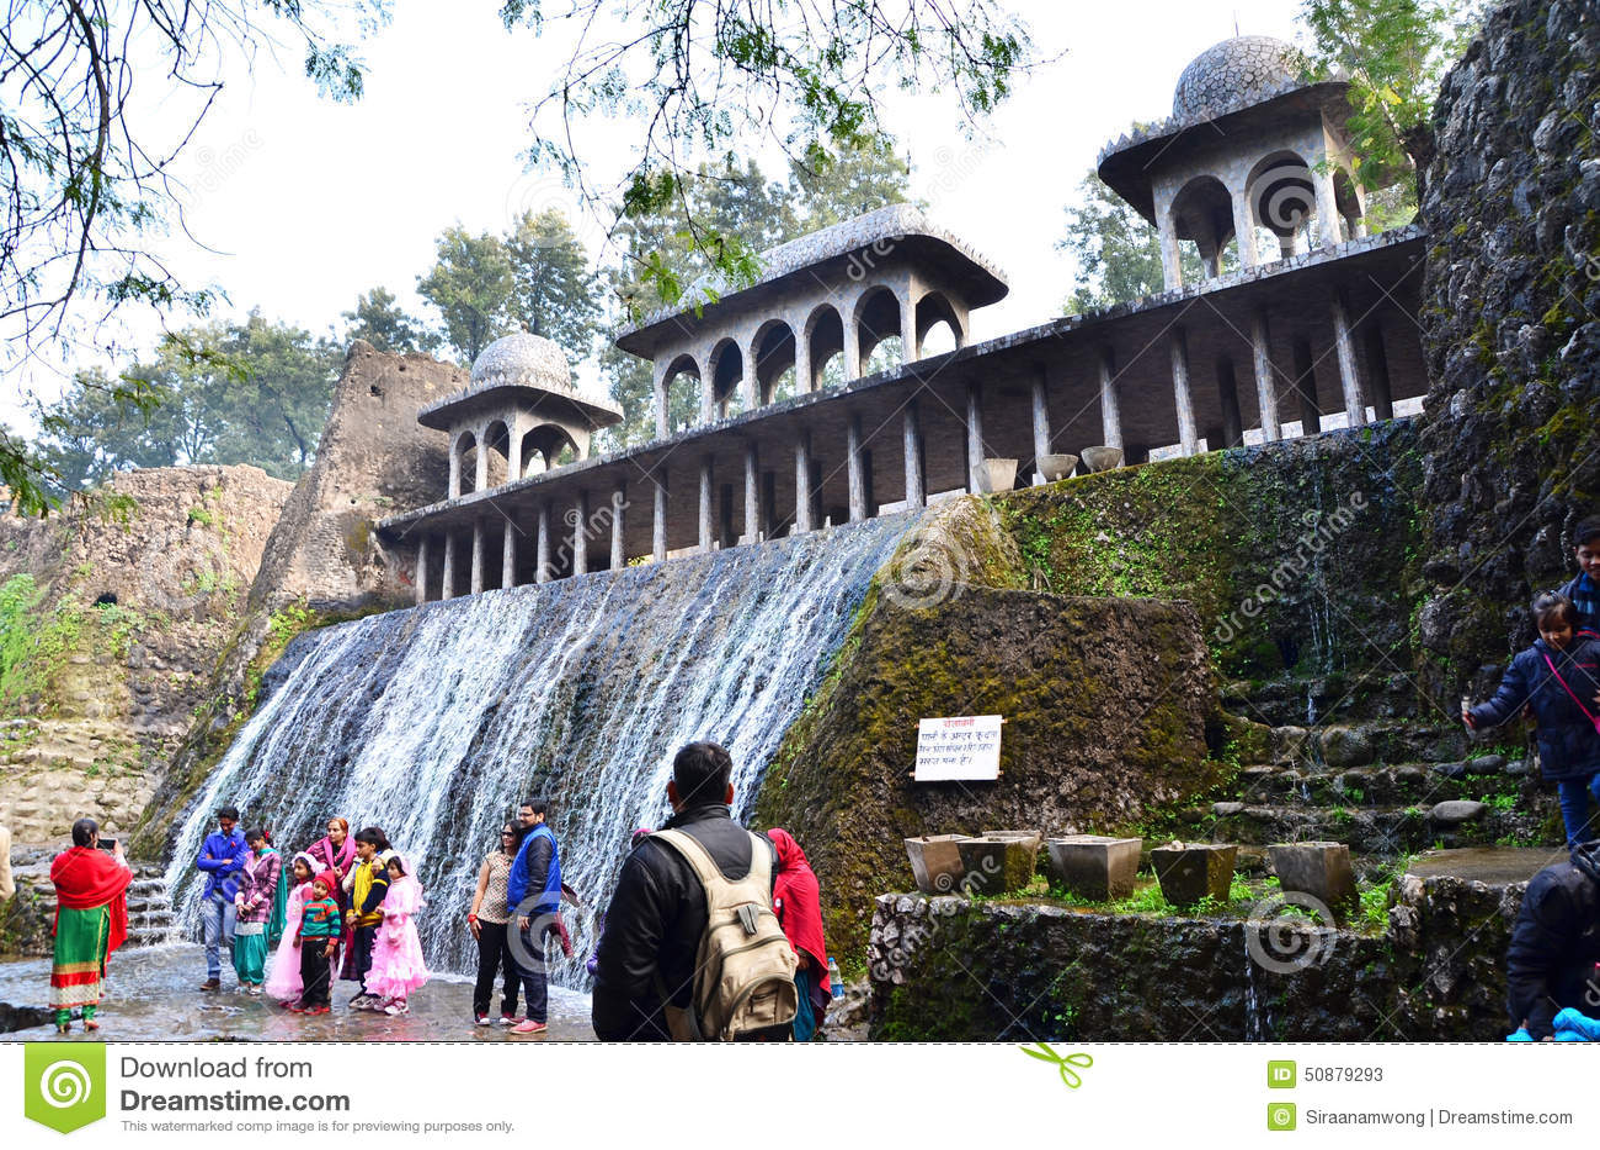 Chandigarh India January 4 2015 People Visit Rock